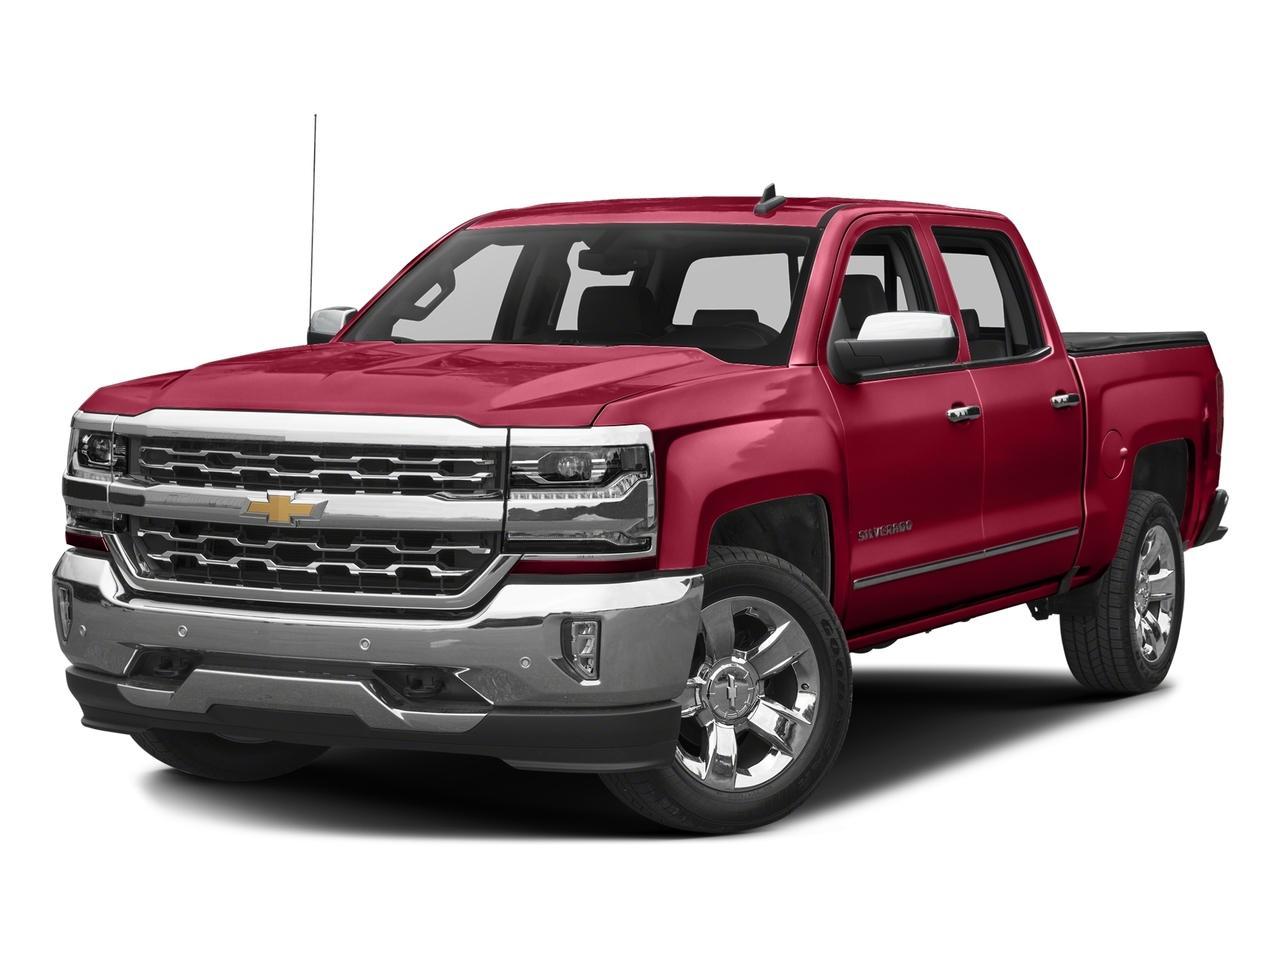 2016 Chevrolet Silverado 1500 Vehicle Photo in Houston, TX 77074